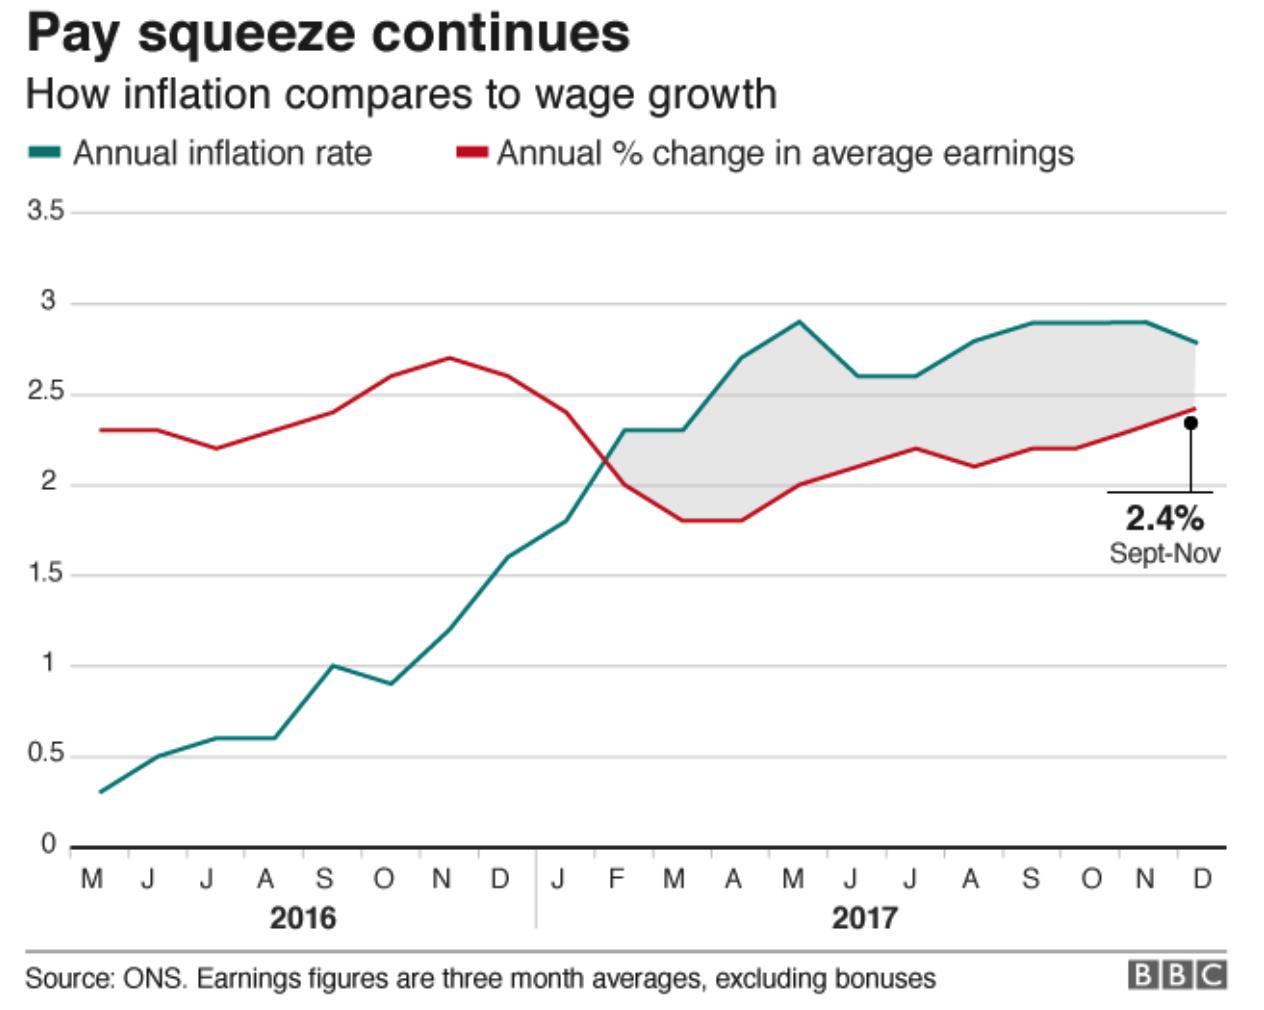 brexit, stagflation pressures uk high street Brexit, Stagflation Pressures UK High Street Snip20180327 16